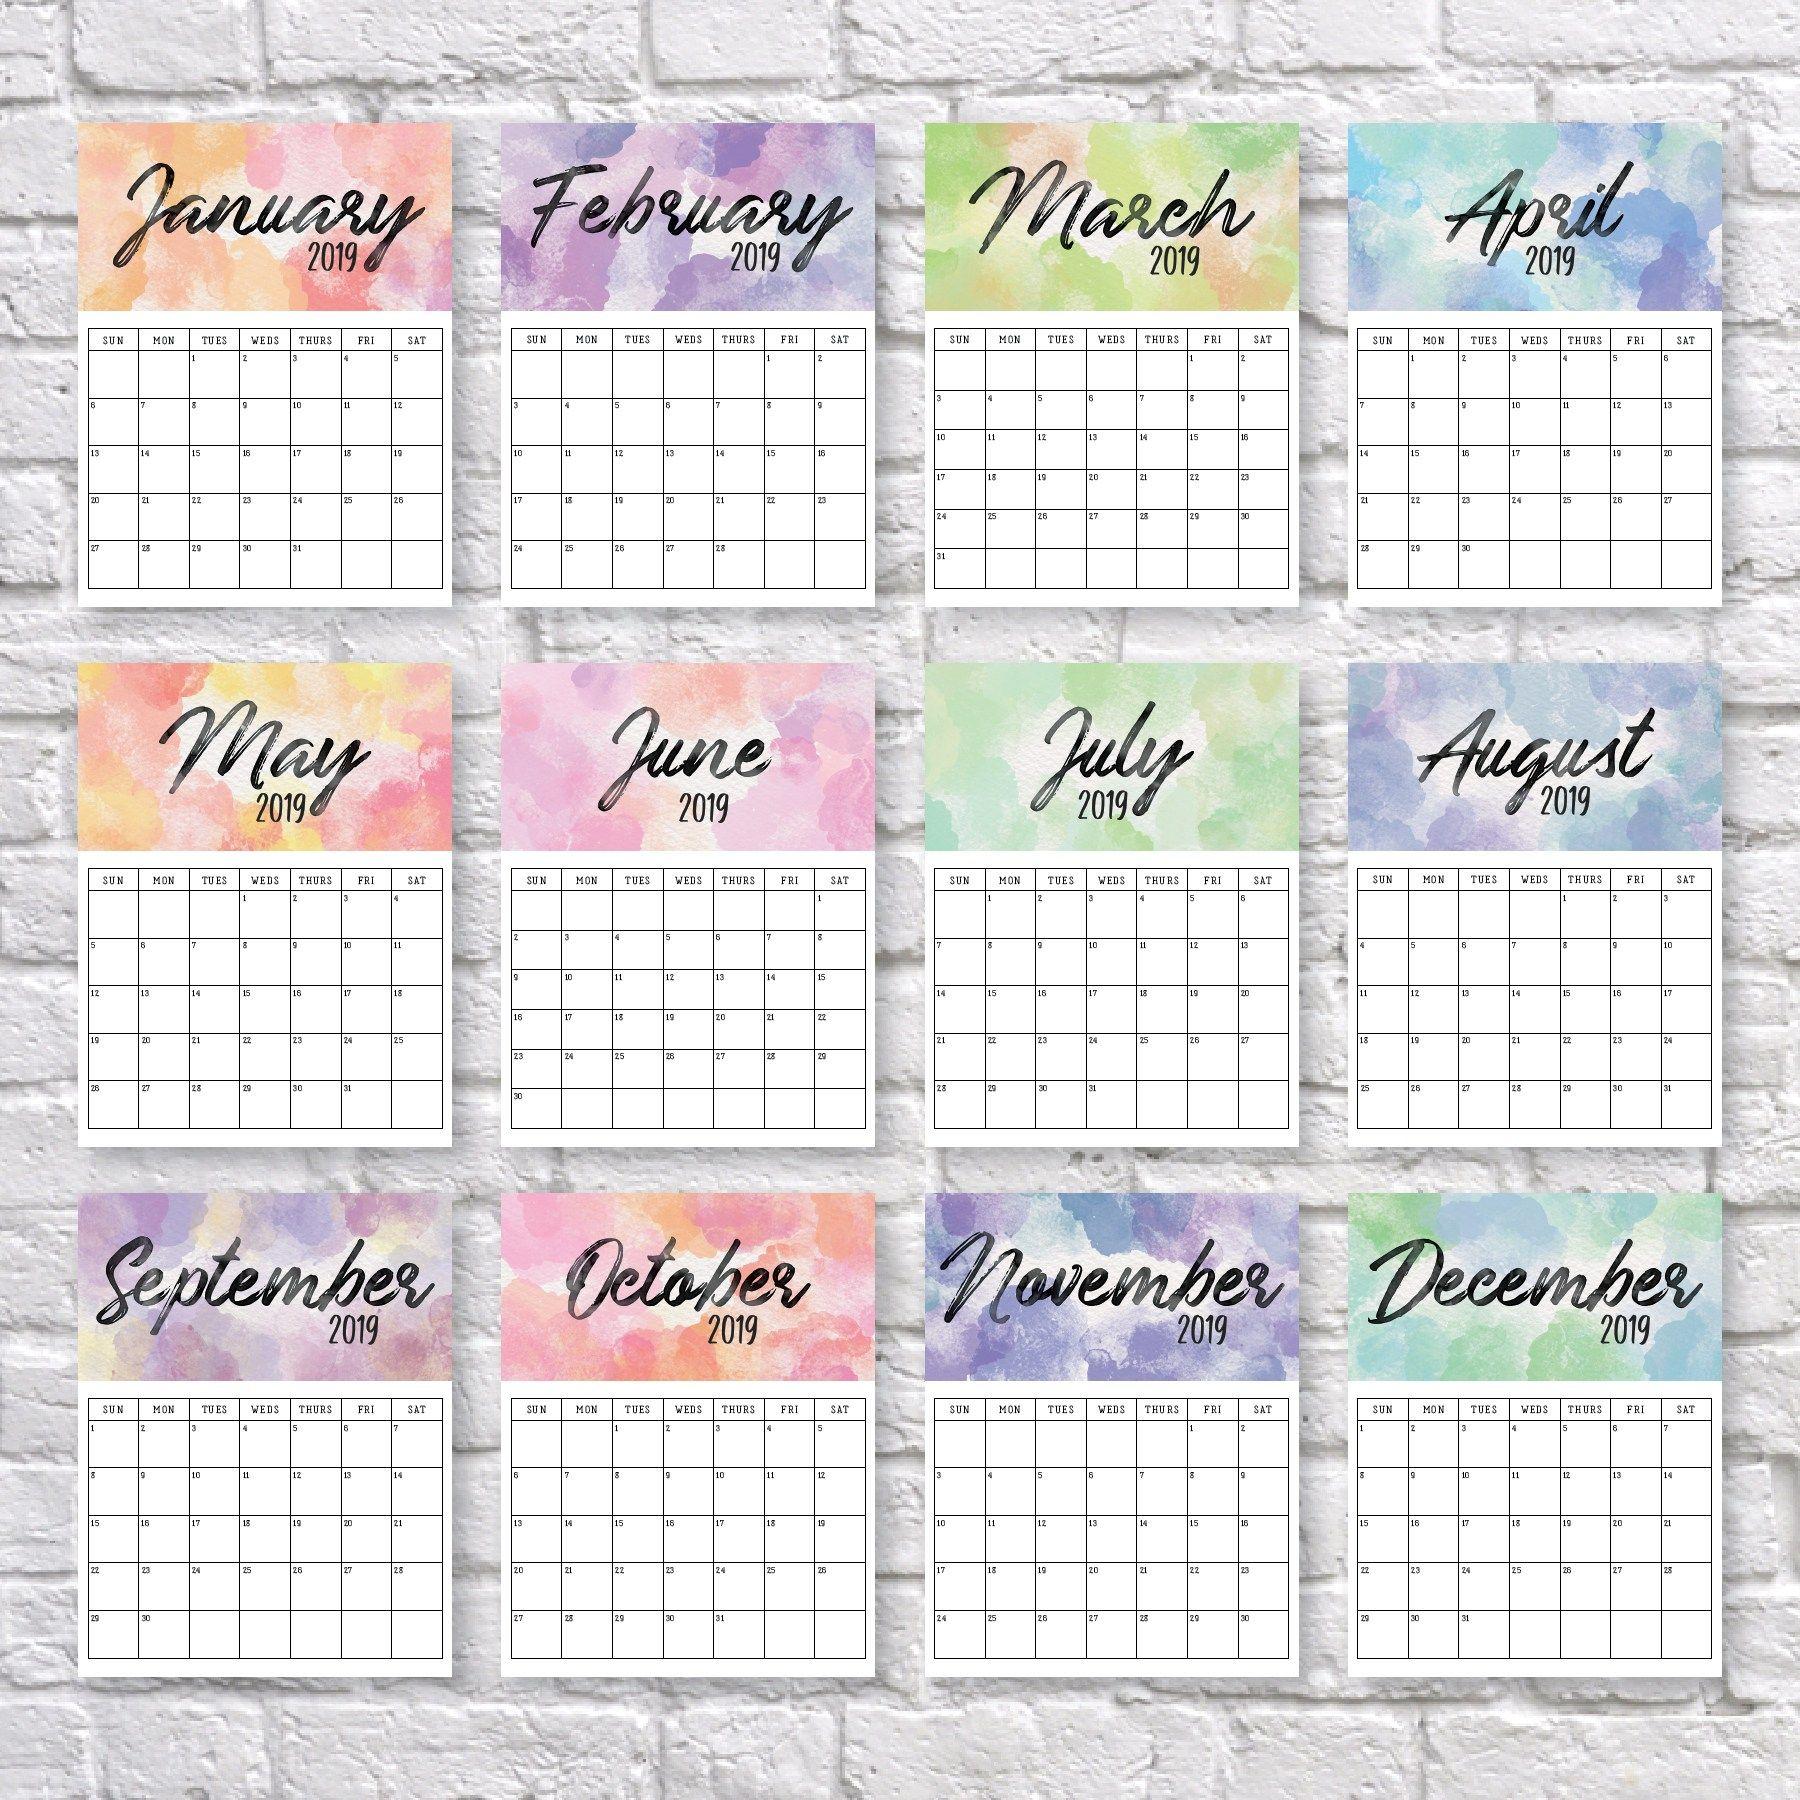 Printable 2020 Calendar | Календарь Для Печати, Календарь И intended for Printable 2020 Wallet Calendar